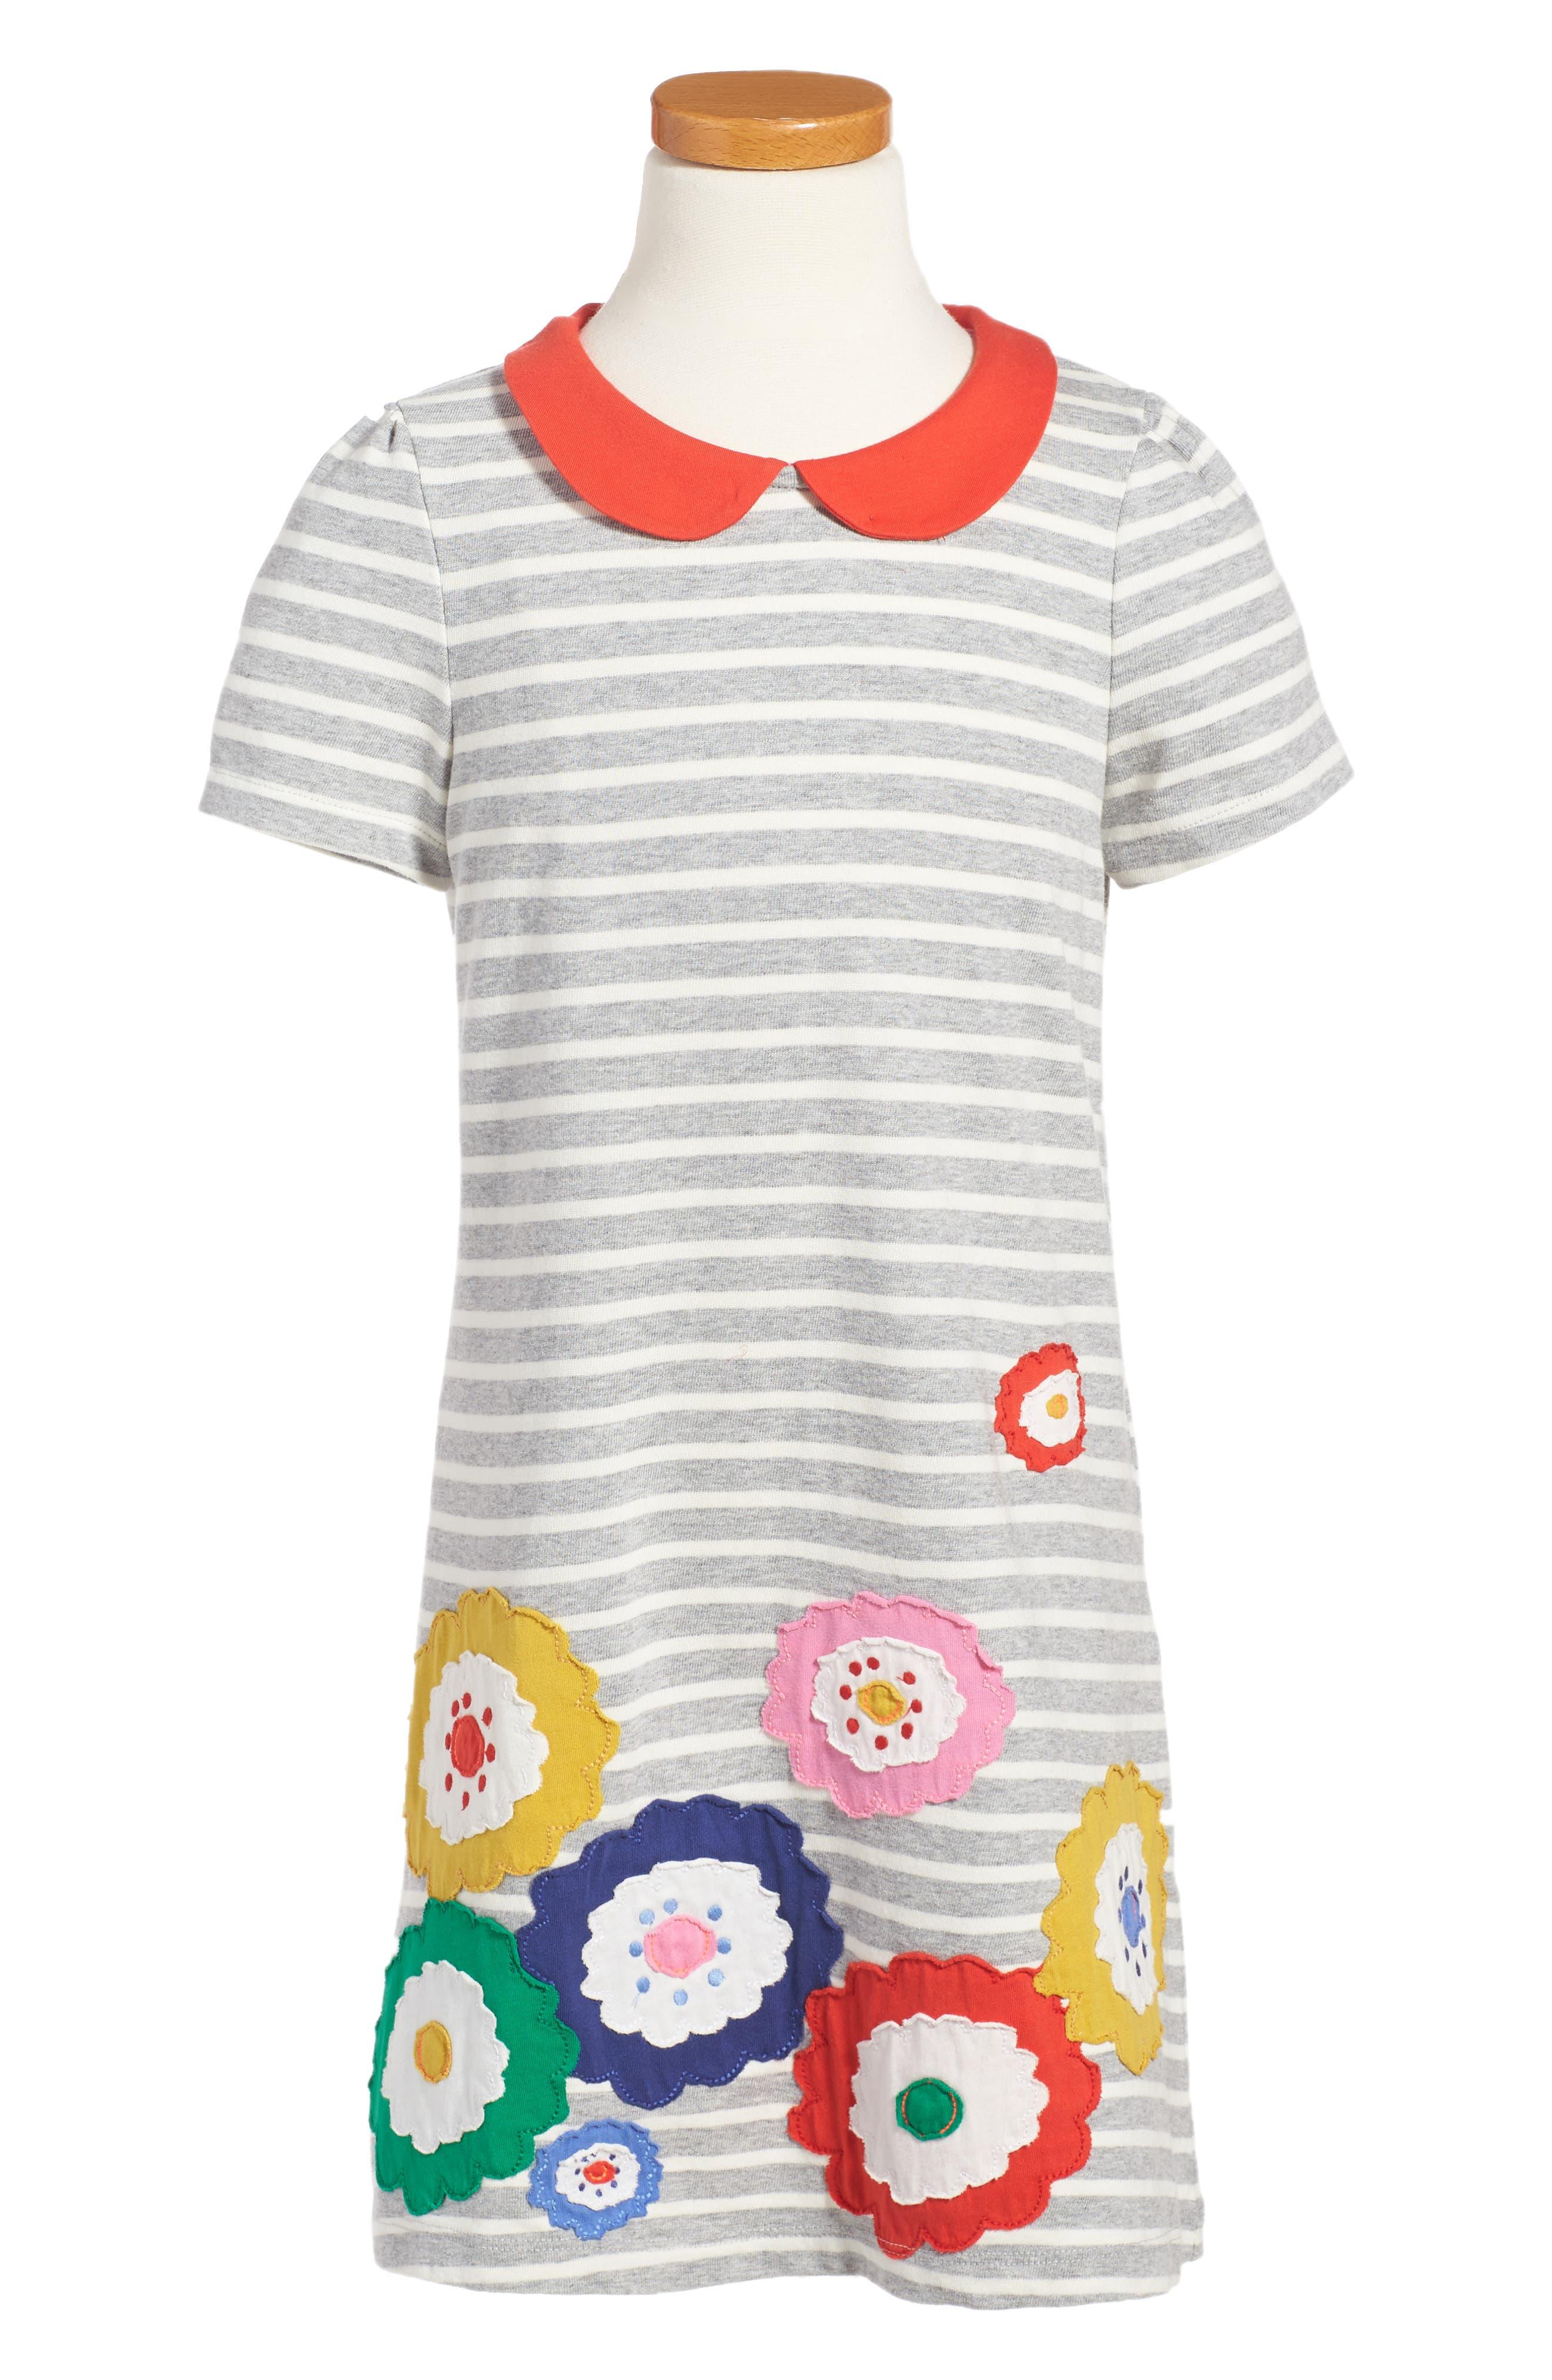 Alternate Image 1 Selected - Mini Boden Fun Appliqué Jersey Dress (Toddler Girls, Little Girls & Big Girls)